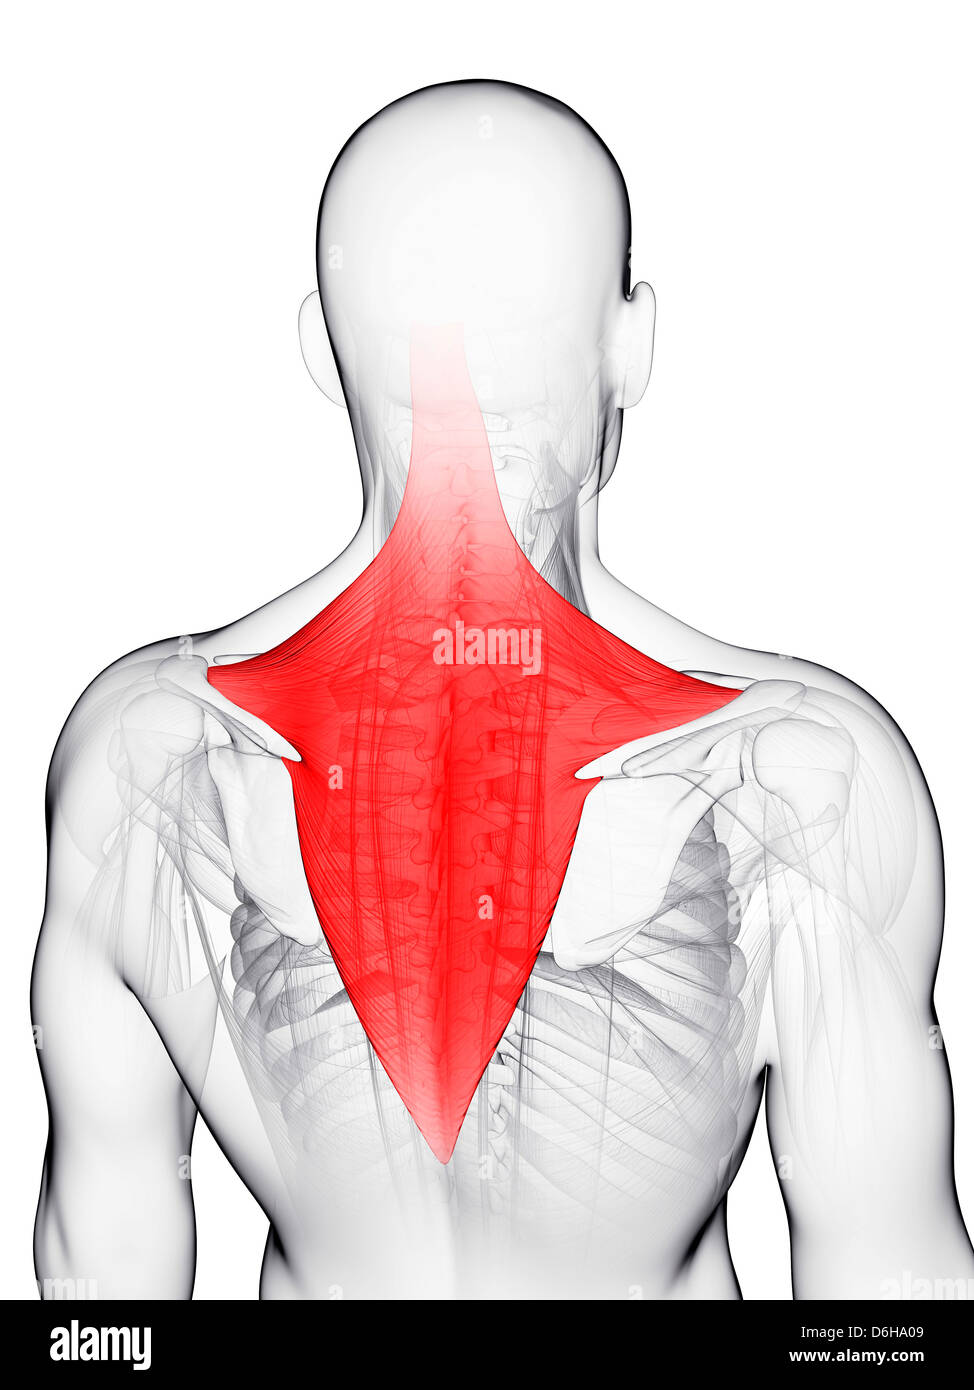 Illustration Trapezius Muscle Stock Photos & Illustration Trapezius ...